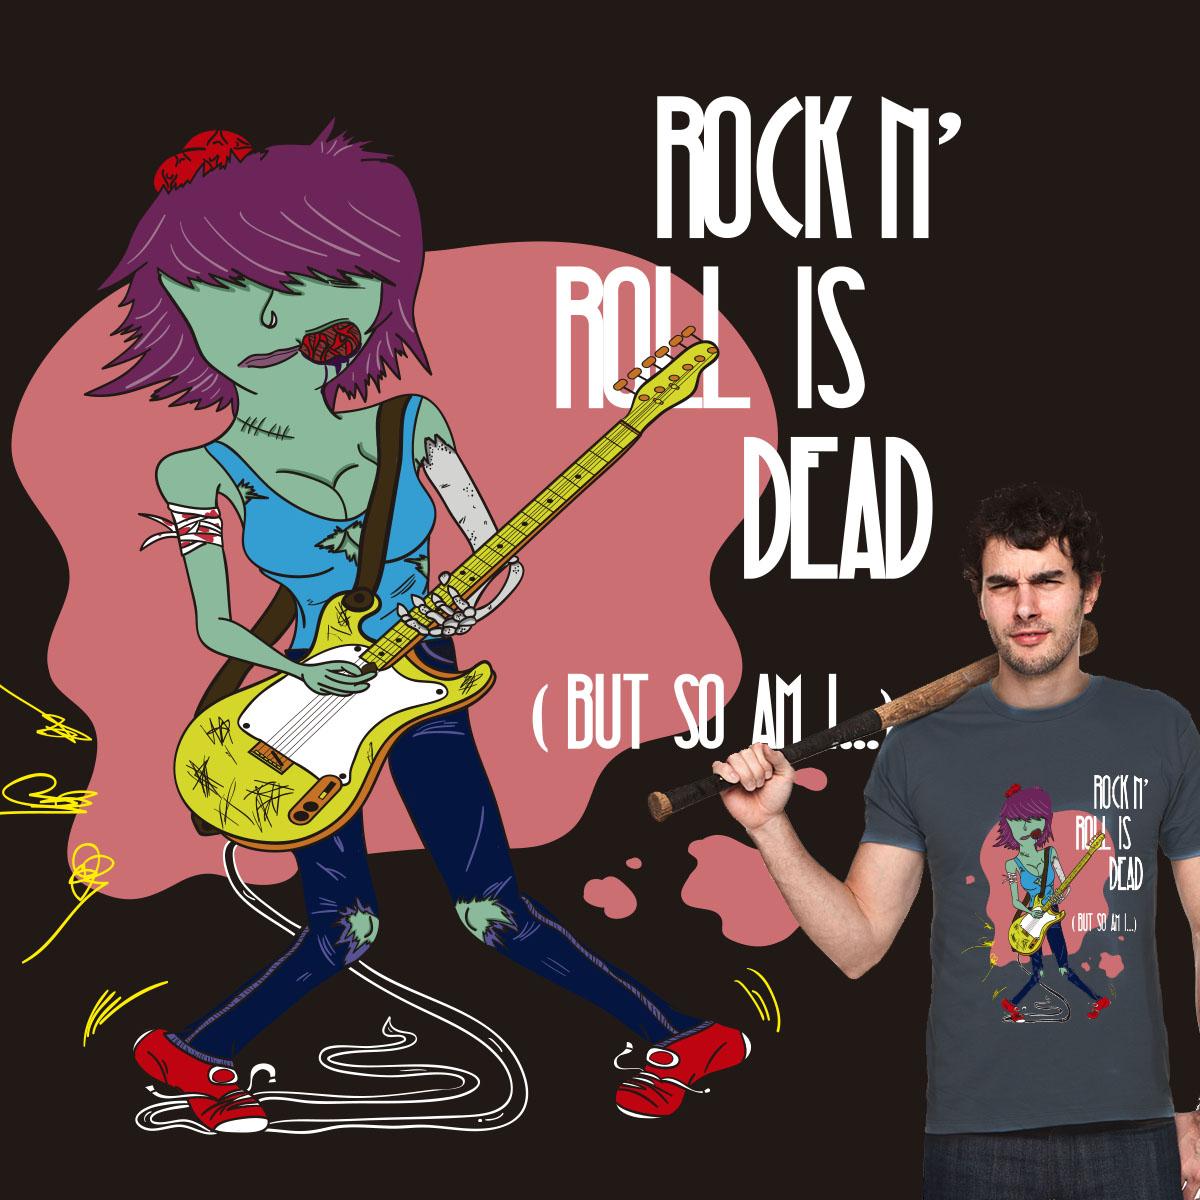 Rock N' Roll is dead (but so am I...) by J.Souza on Threadless